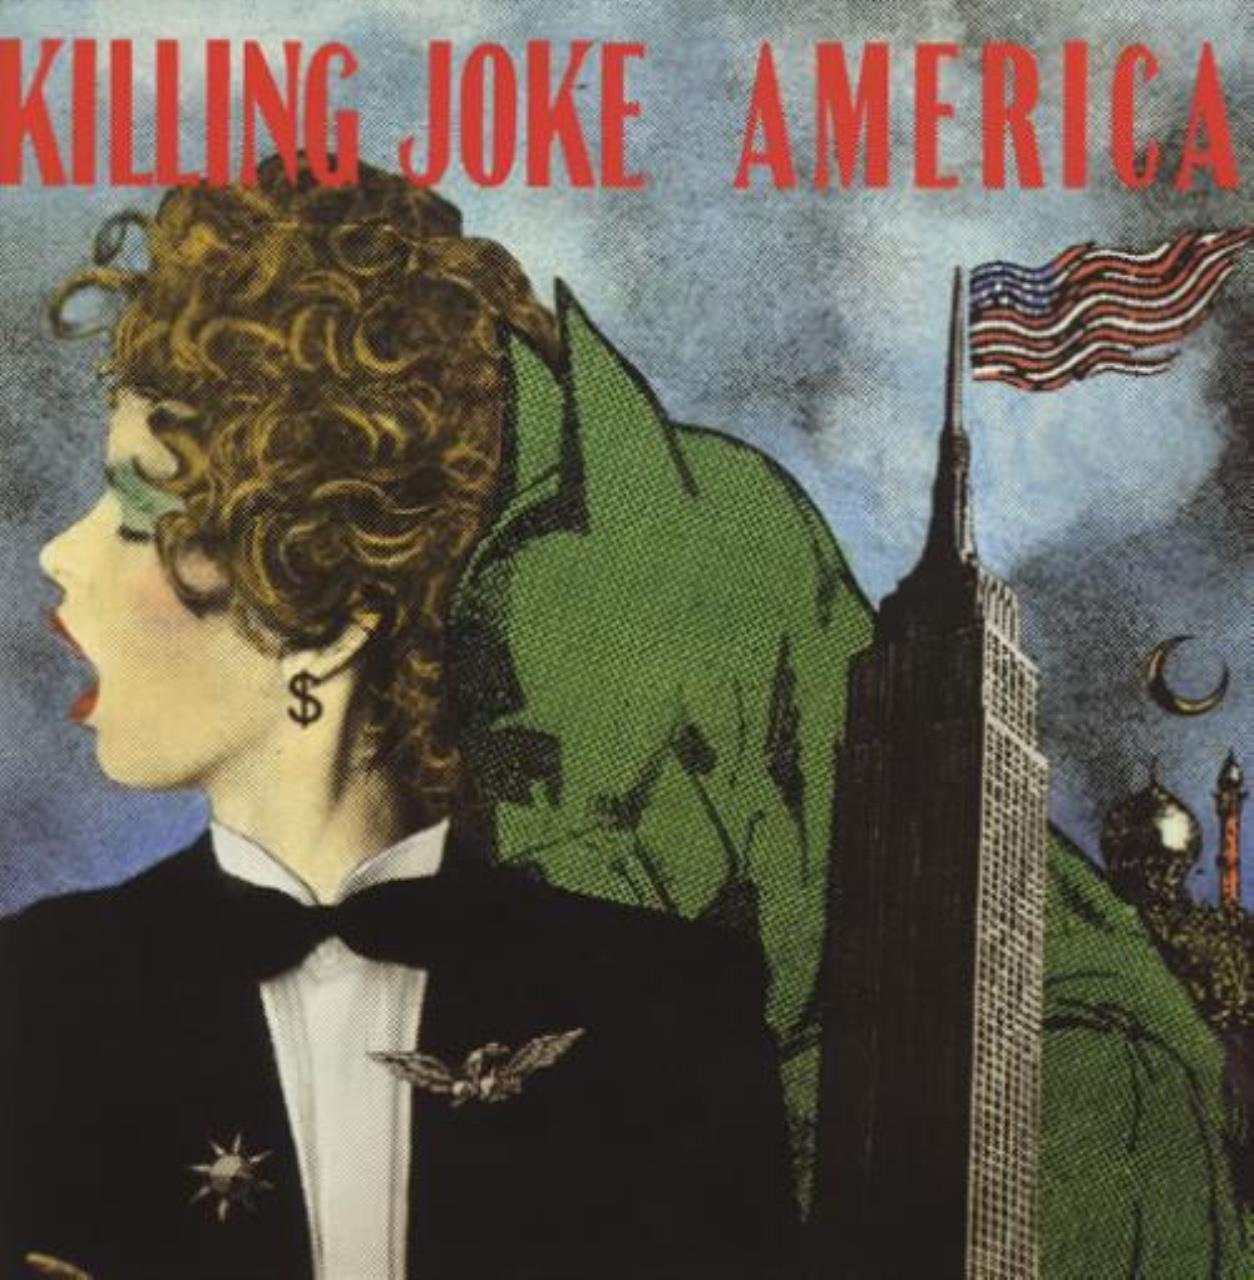 Killing Joke - Página 10 71ZAbz%2BaEXL._SL1280_